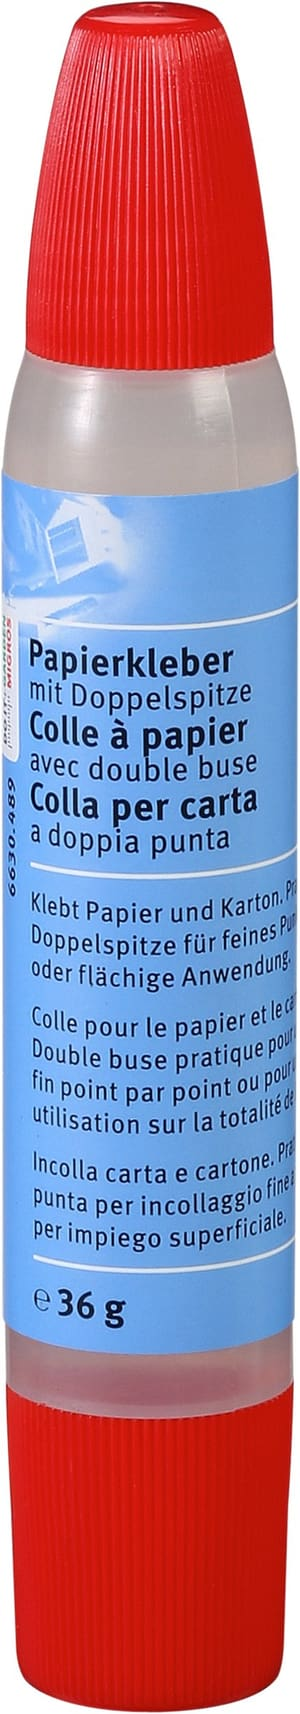 Papierkleber